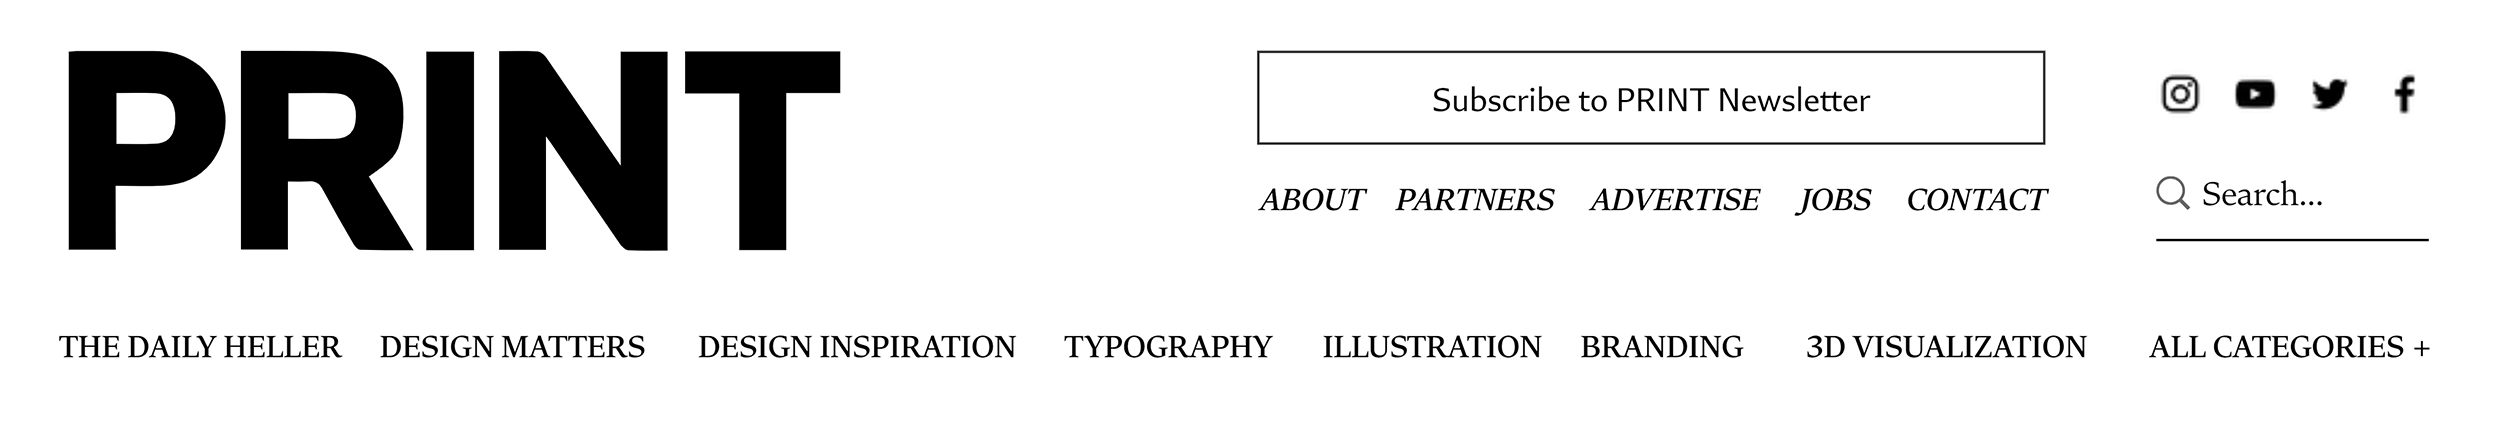 printmag-new-min.png